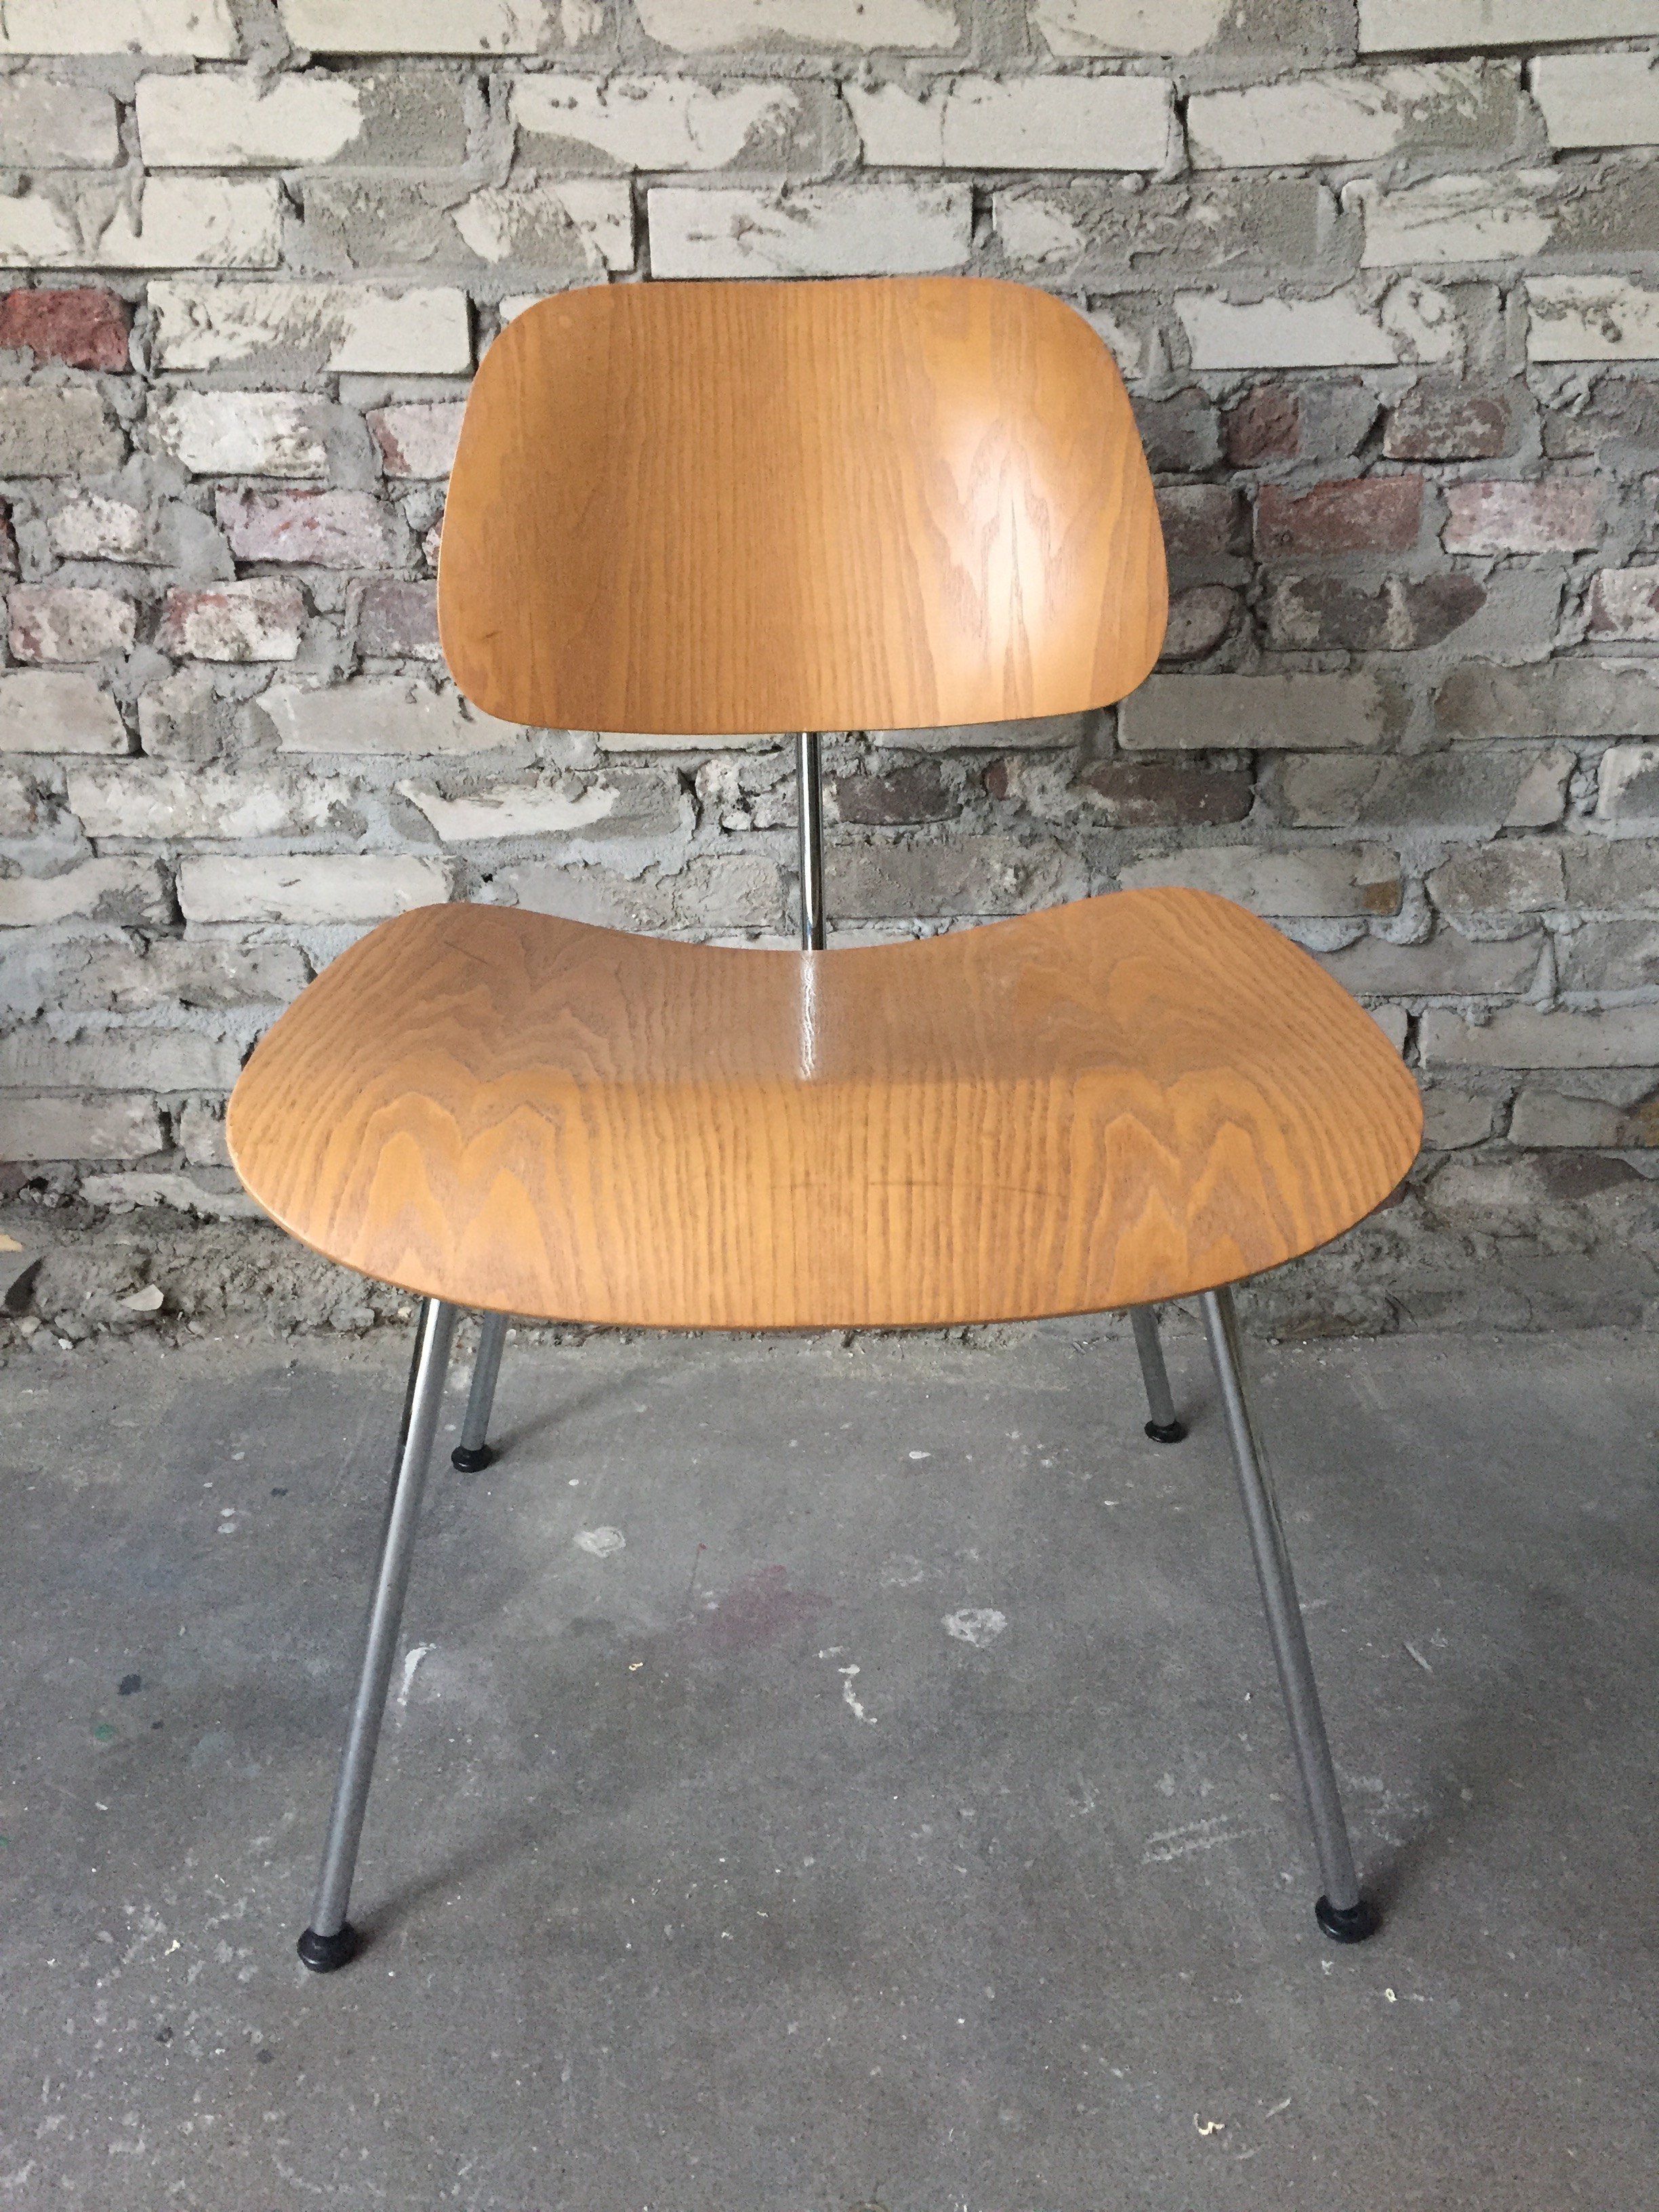 Products Chairs Eames DCM The Dutch Villa : IMG5499 from www.thedutchvilla.com size 2448 x 3264 jpeg 1916kB